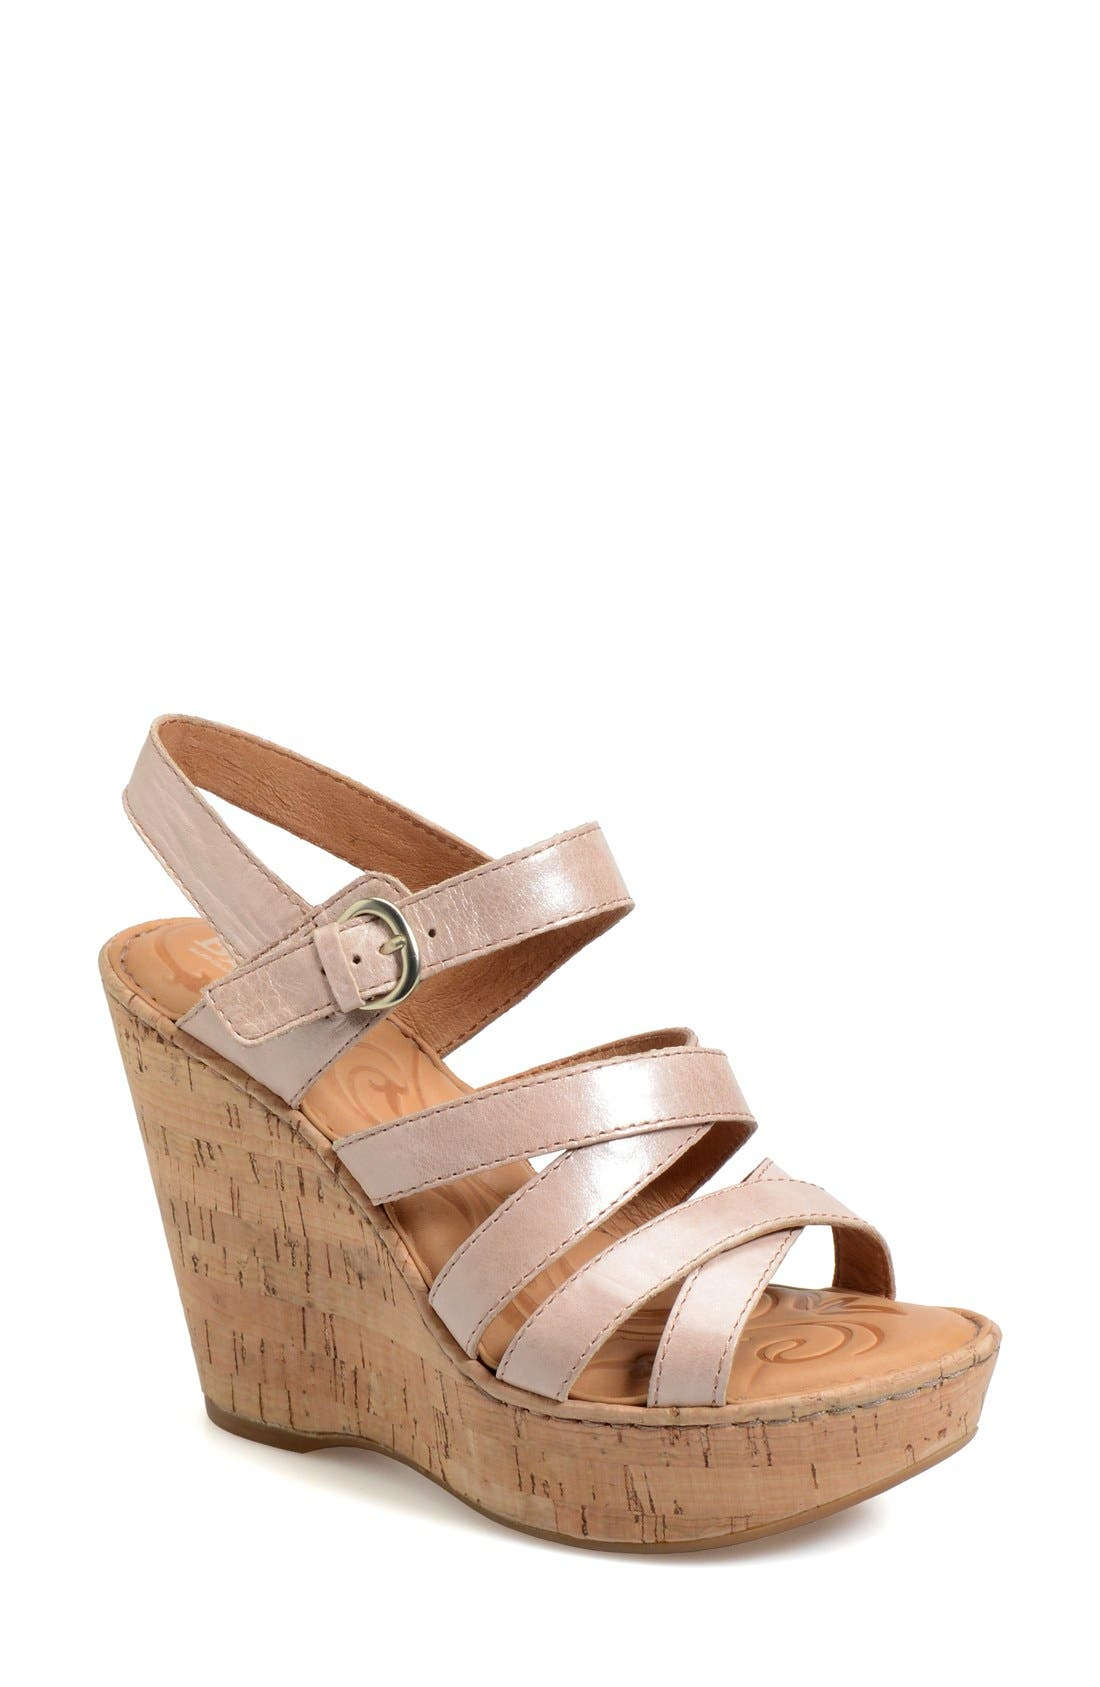 Børn 'Zela' Strappy Wedge Sandal (Women)